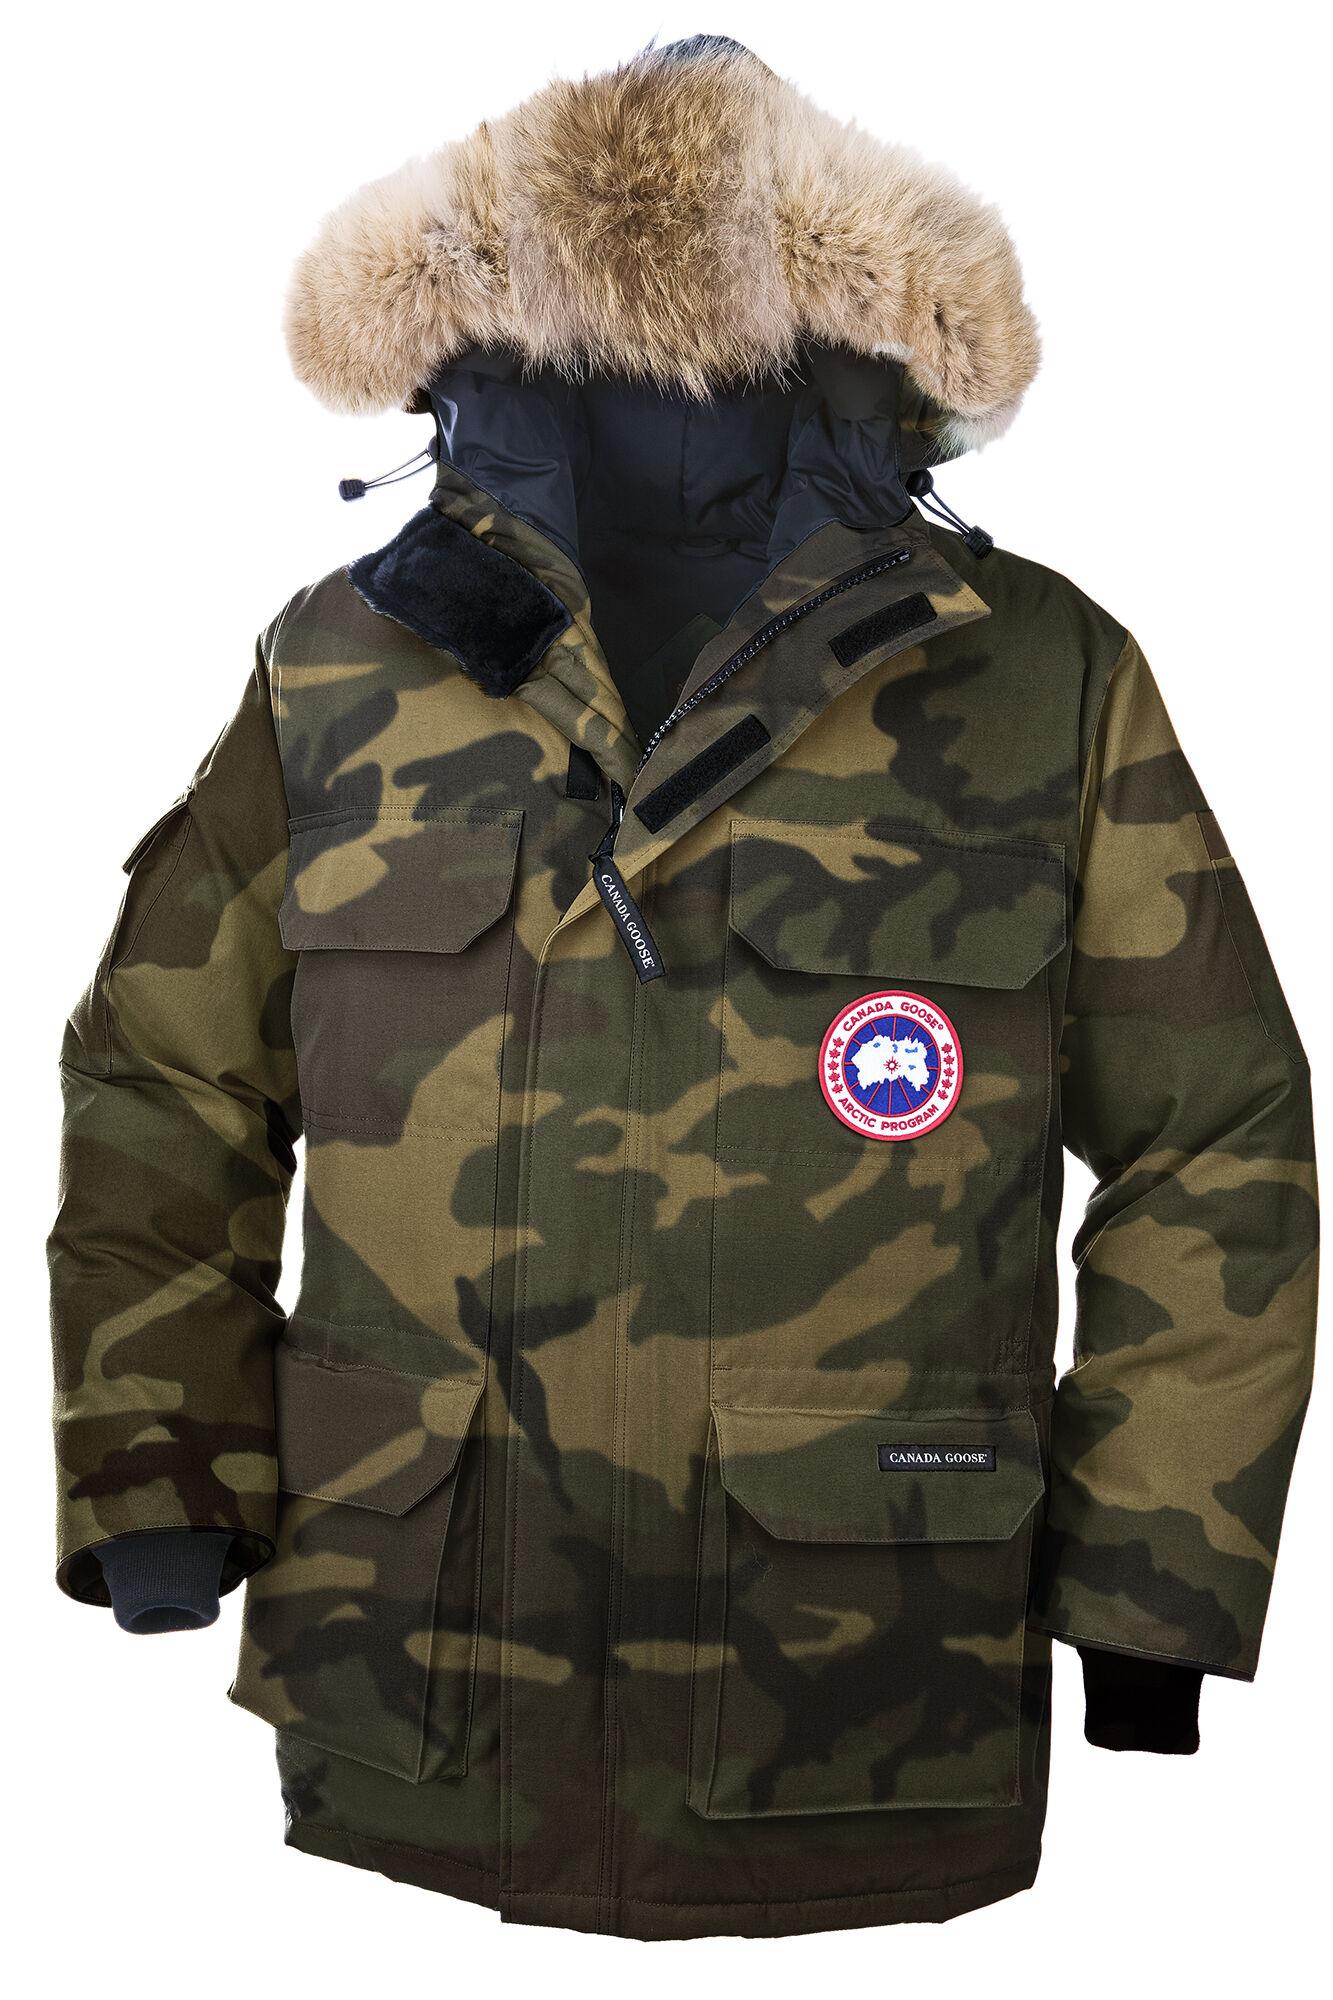 Canada Goose victoria parka outlet authentic - Men's Arctic Program Expedition Parka | Canada Goose? | Canada Goose?